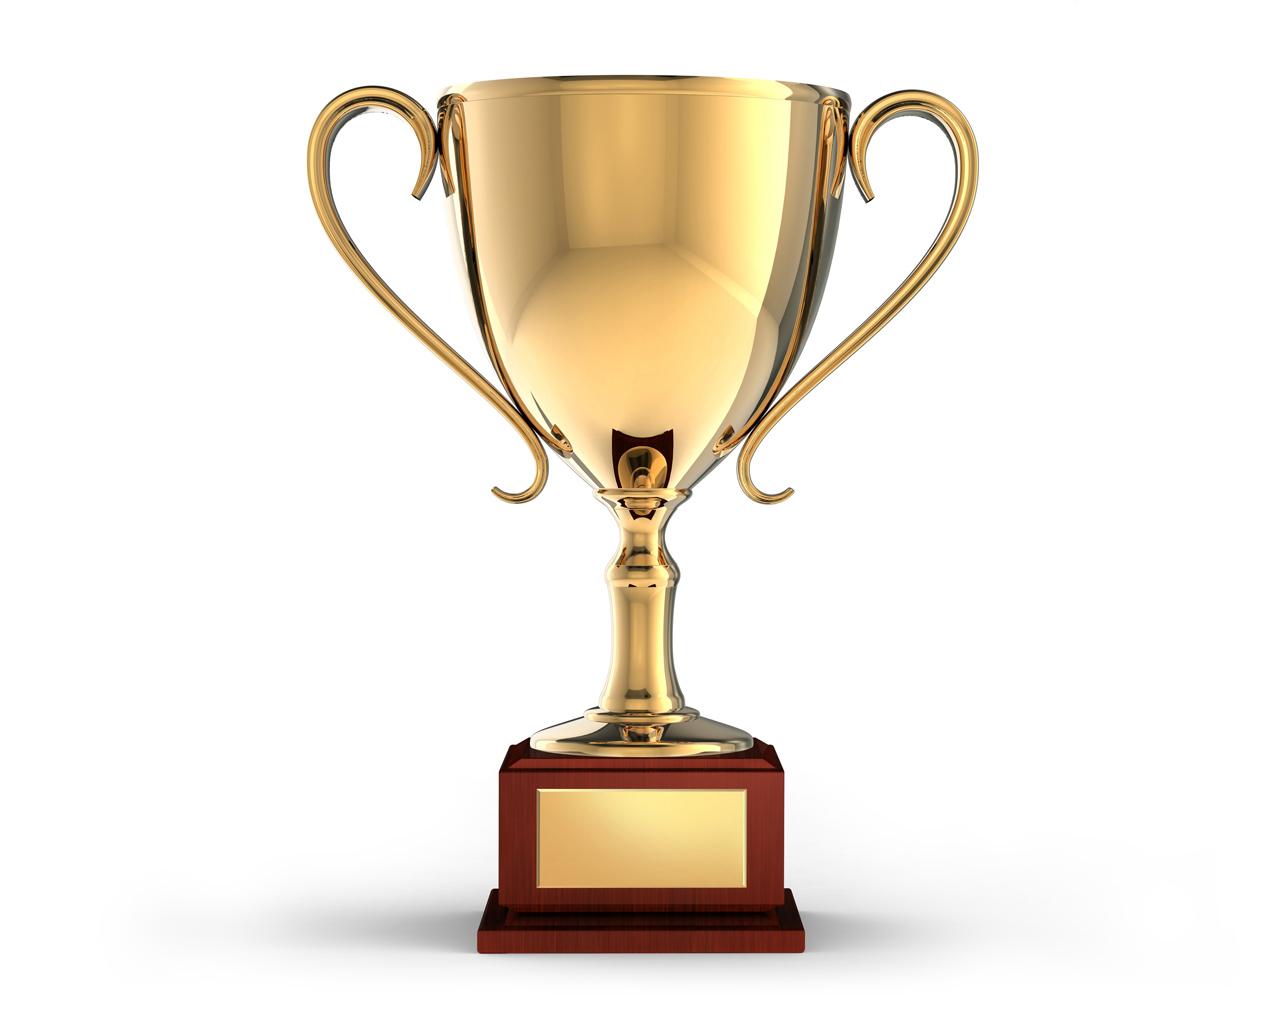 1280x1024 Trophies, Awards Amp Plaques